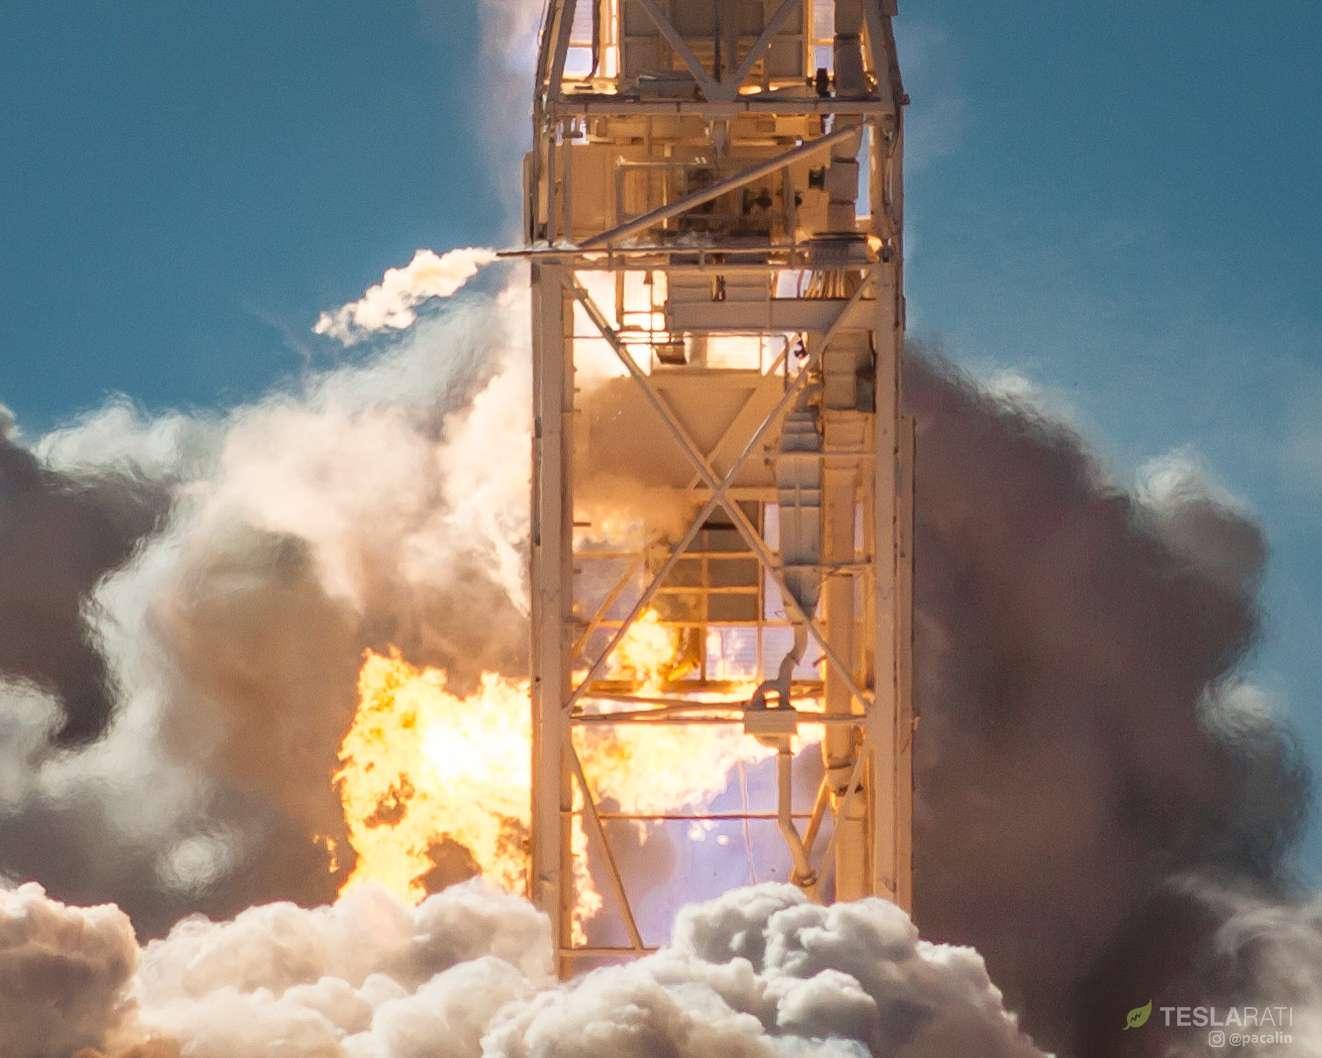 Falcon 9 B1046 SSO-A liftoff (Pauline Acalin) detail 2(c)